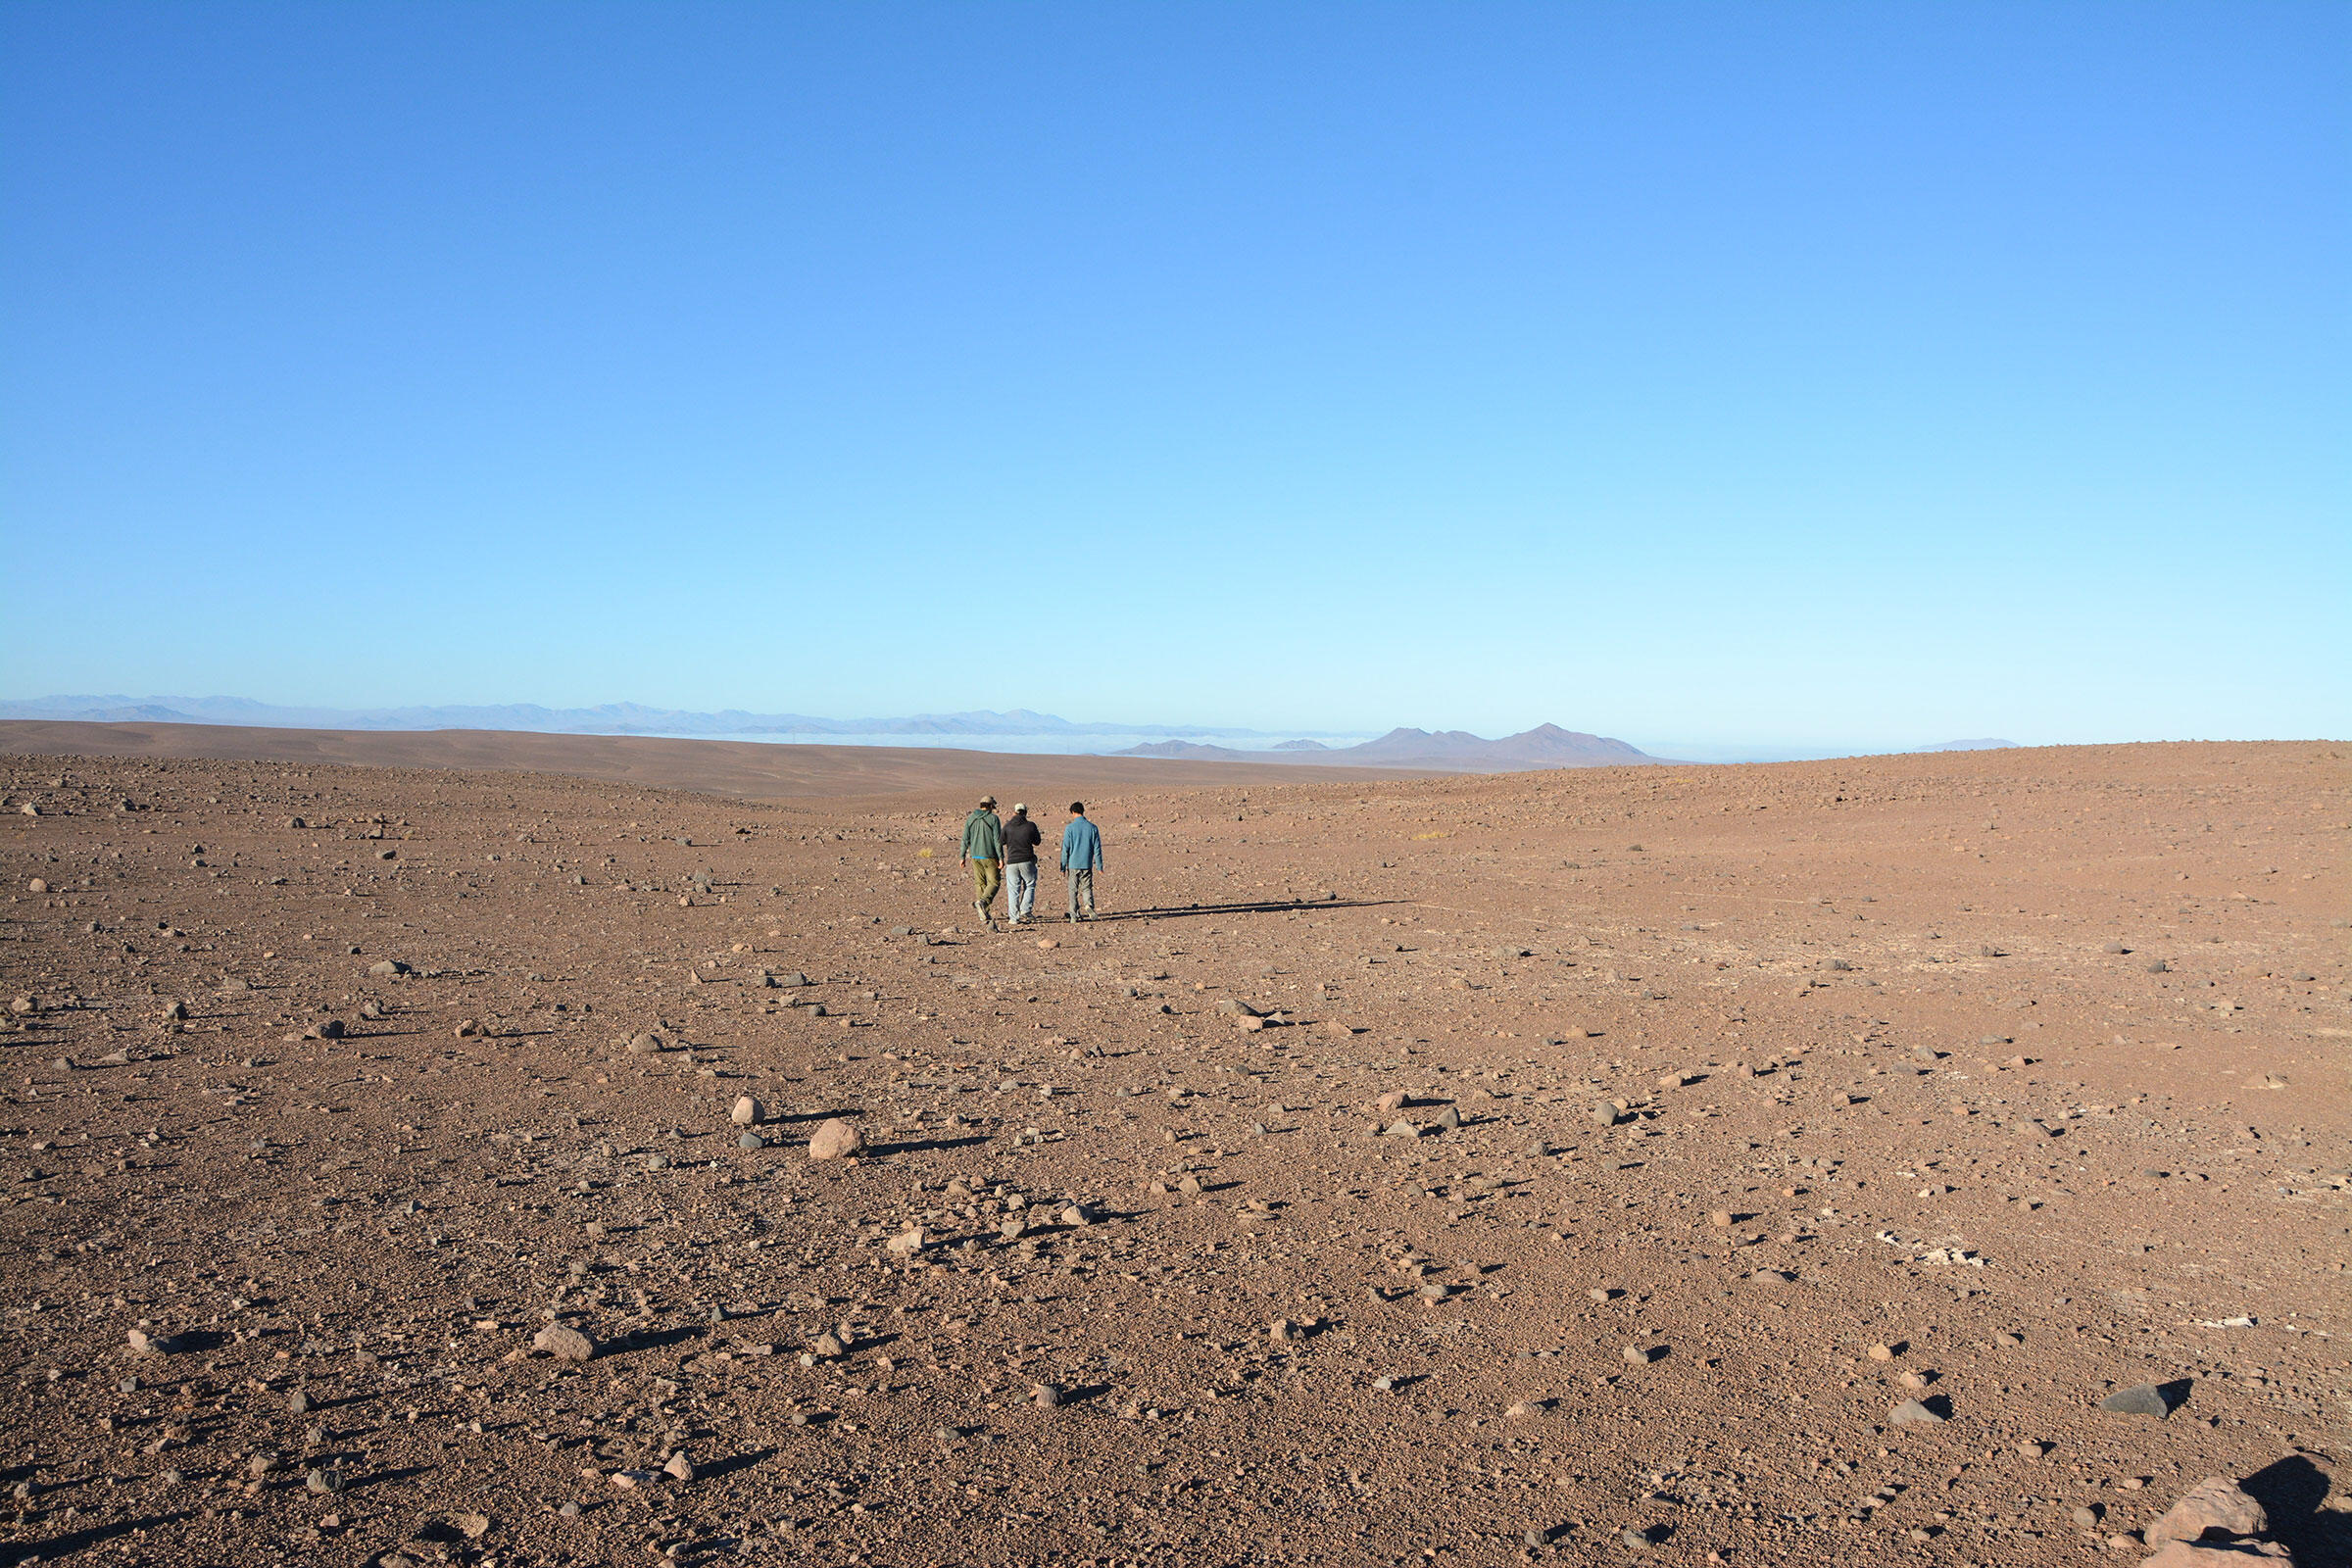 Hornby's Storm Petrel nesting colony site in the Atacama Desert. Felipe de Groote